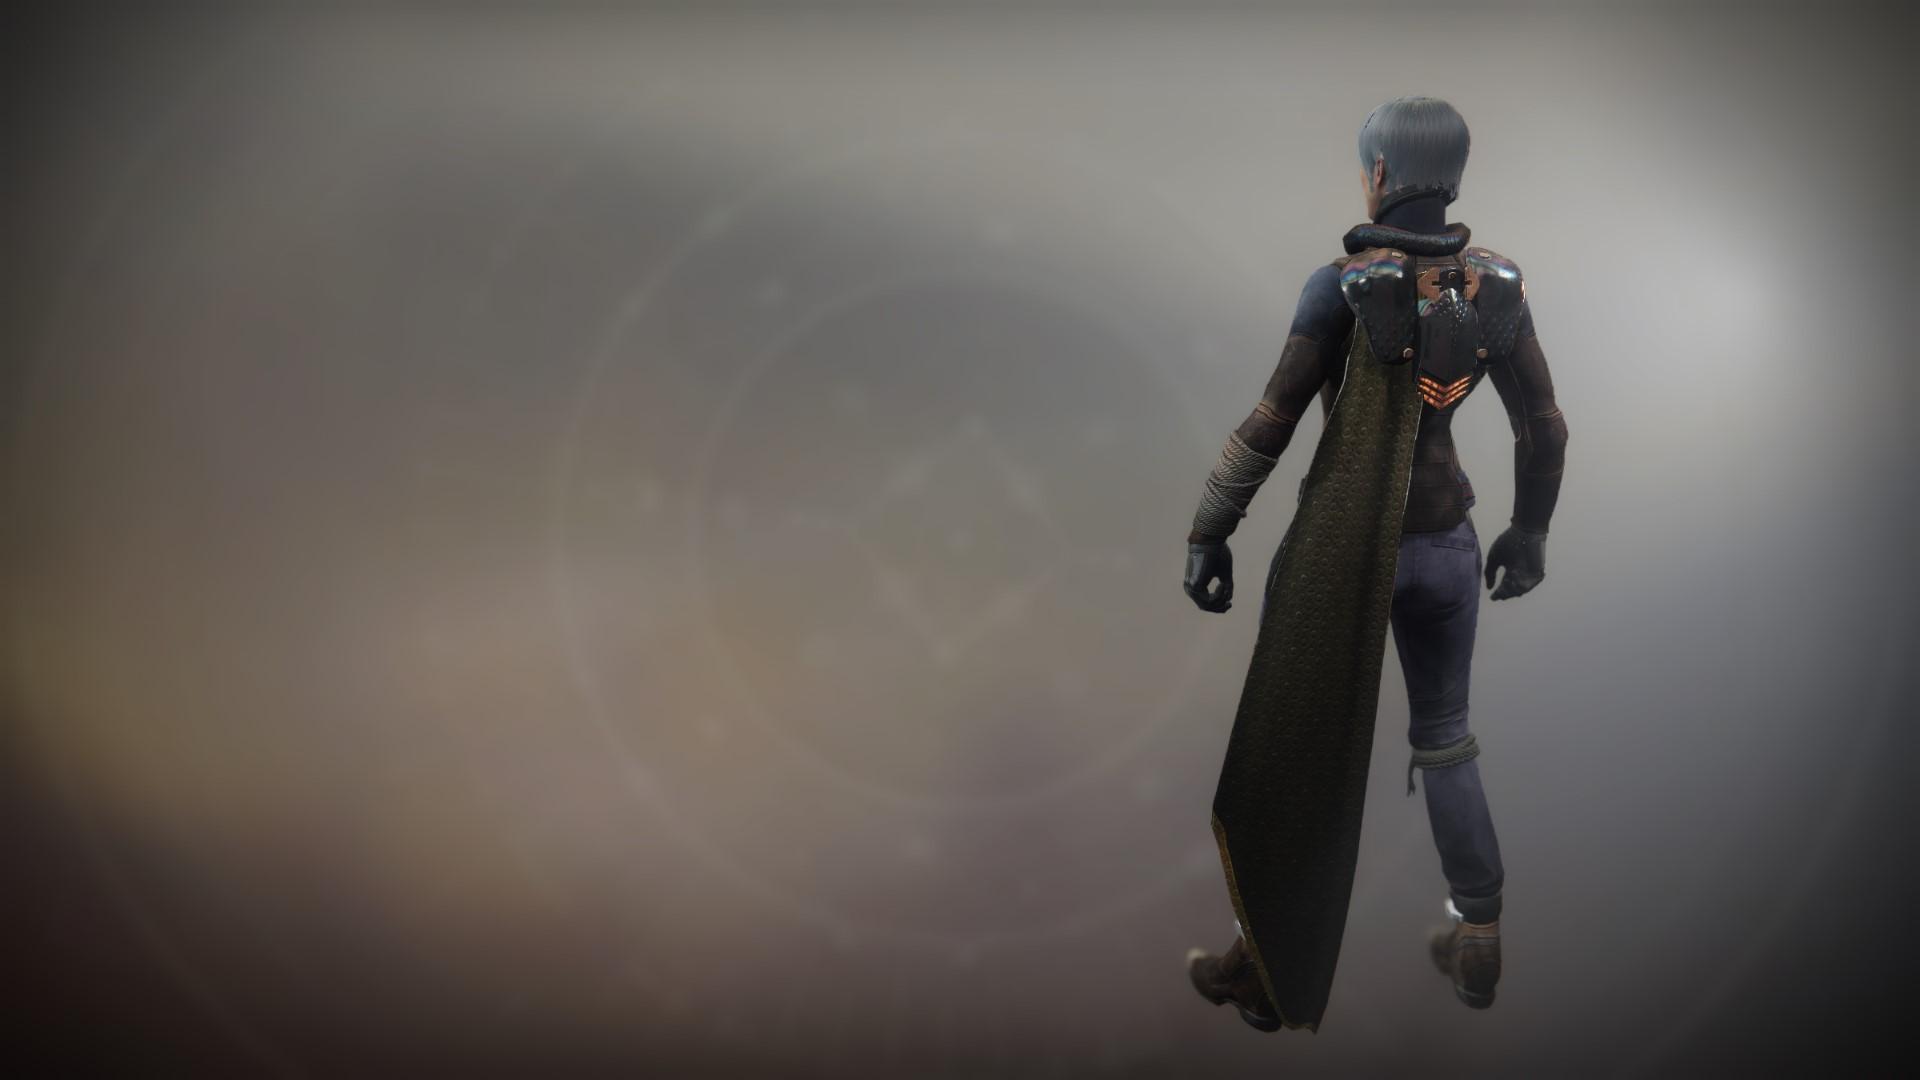 An in-game render of the Cloak of Feltroc.